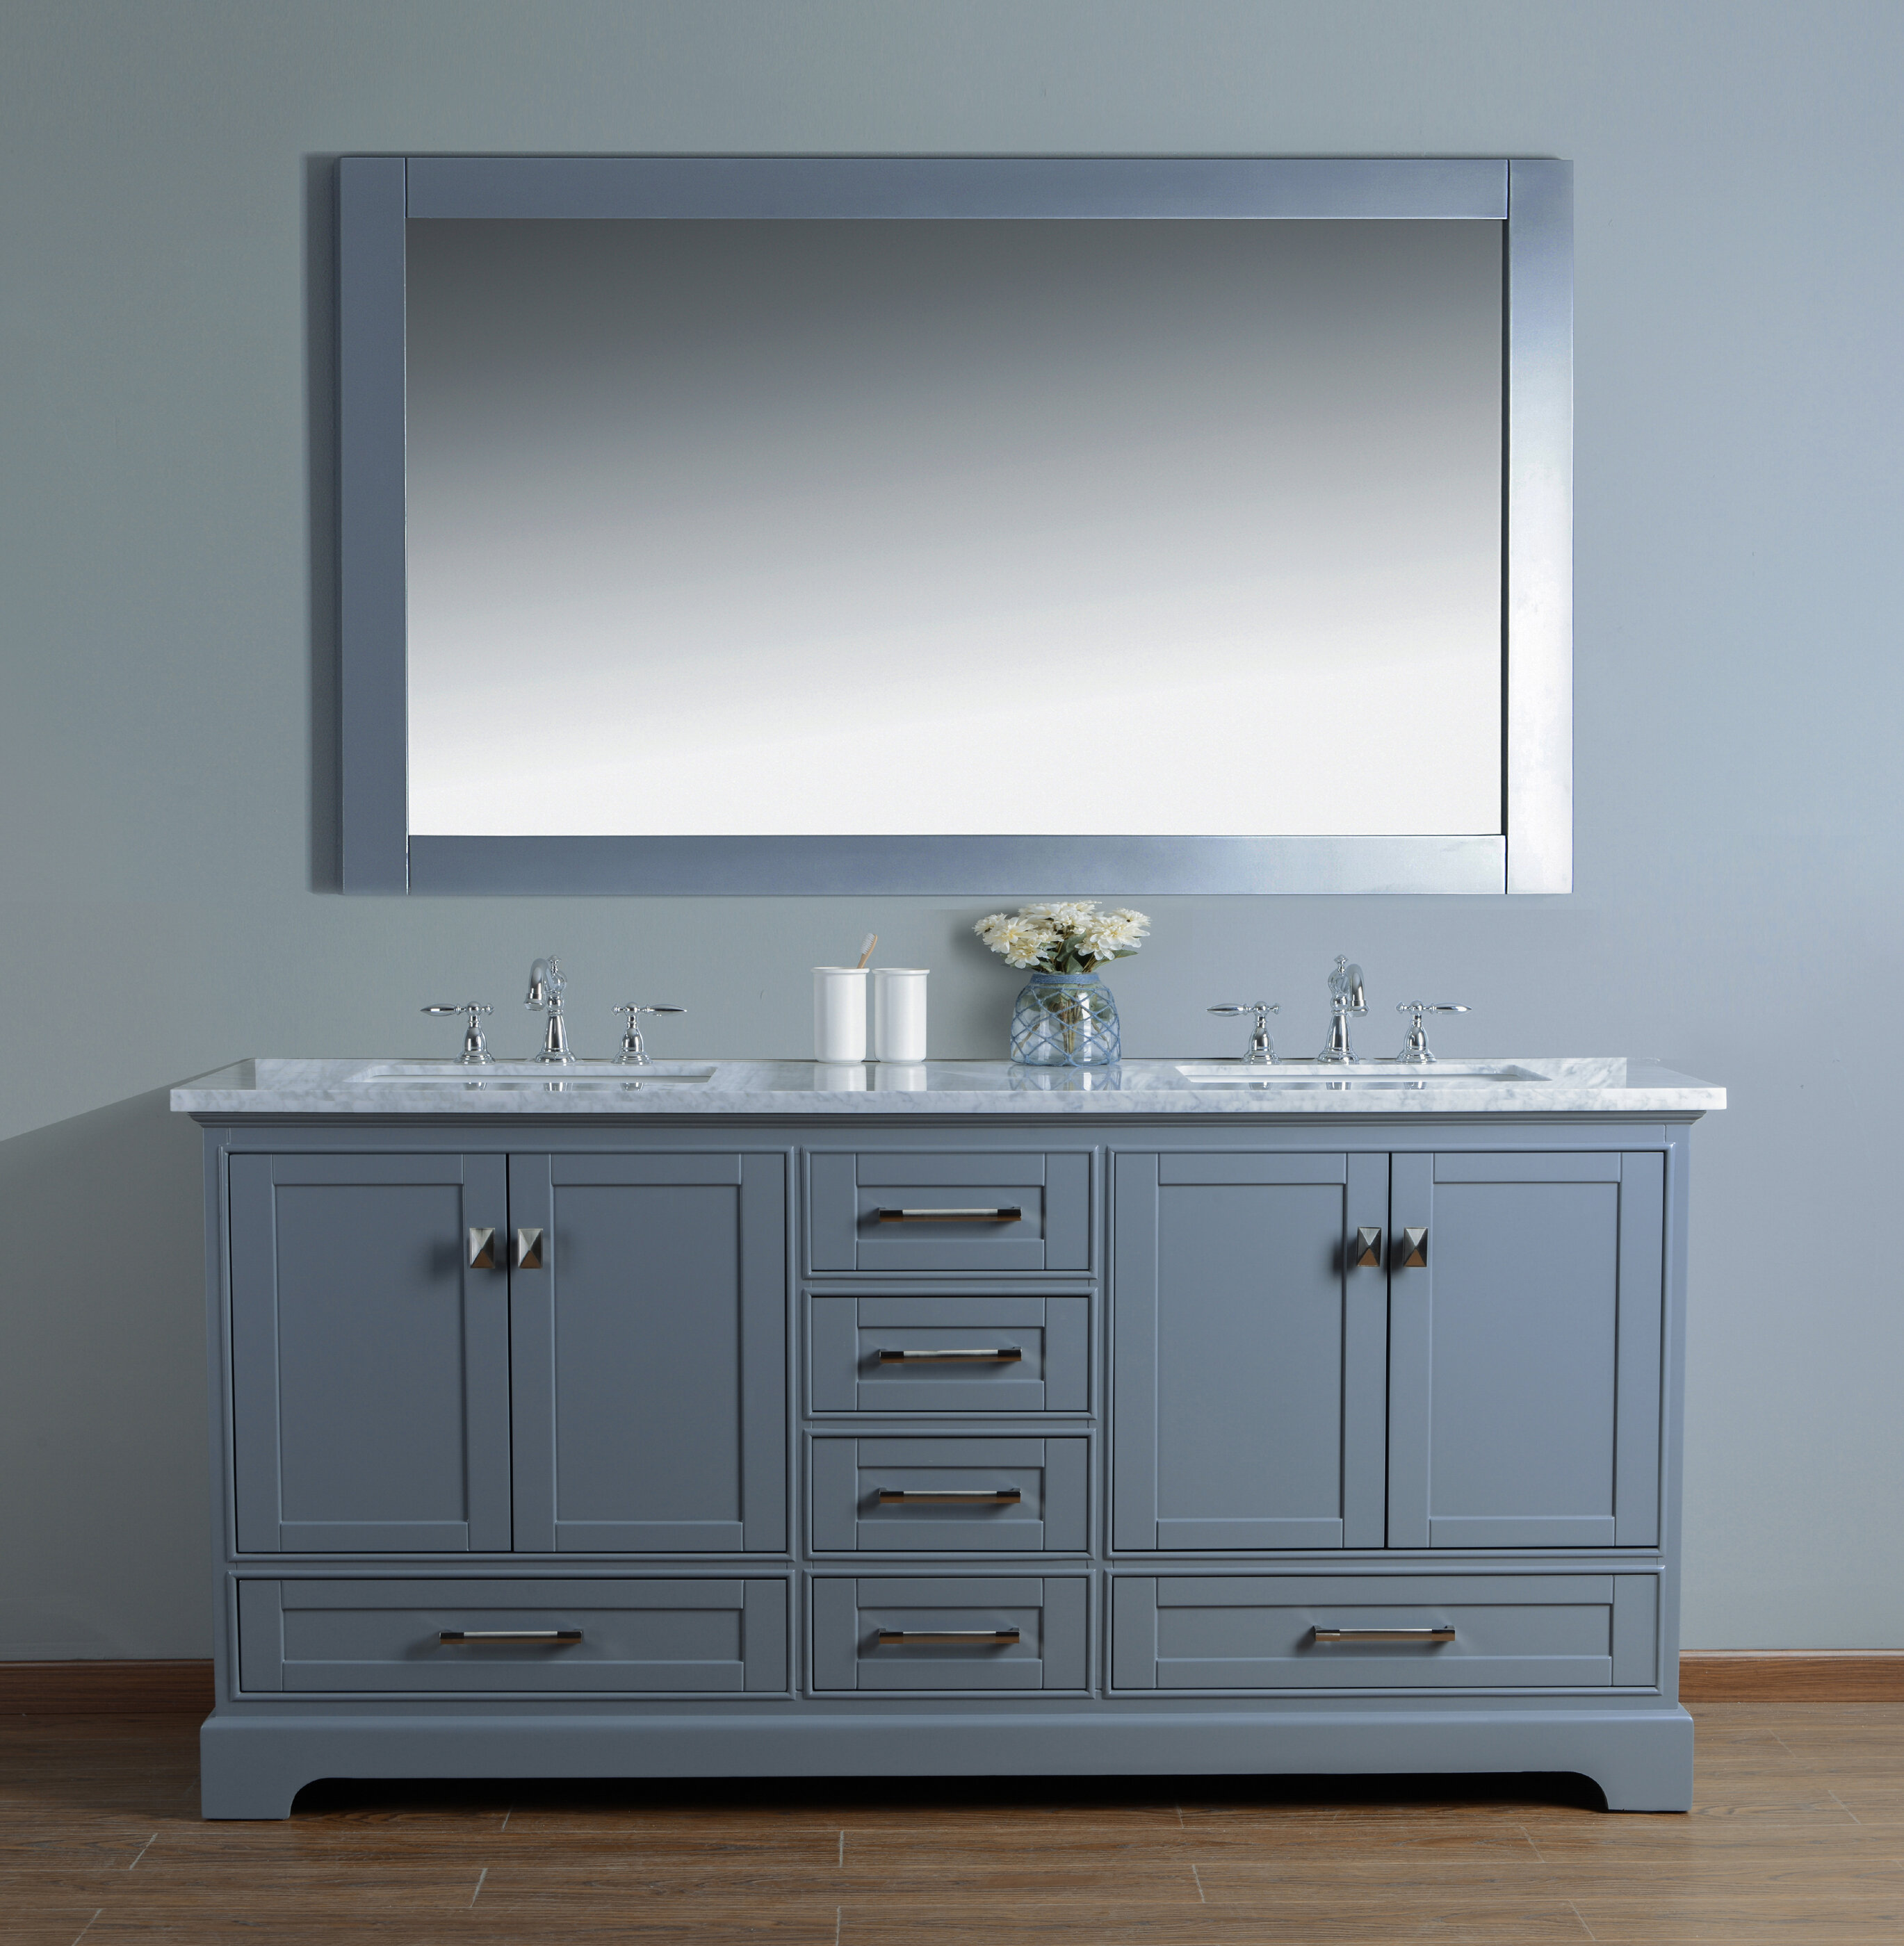 Willa Arlo Interiors Stian 72 Double Sink Bathroom Vanity Set With Mirror Reviews Wayfair